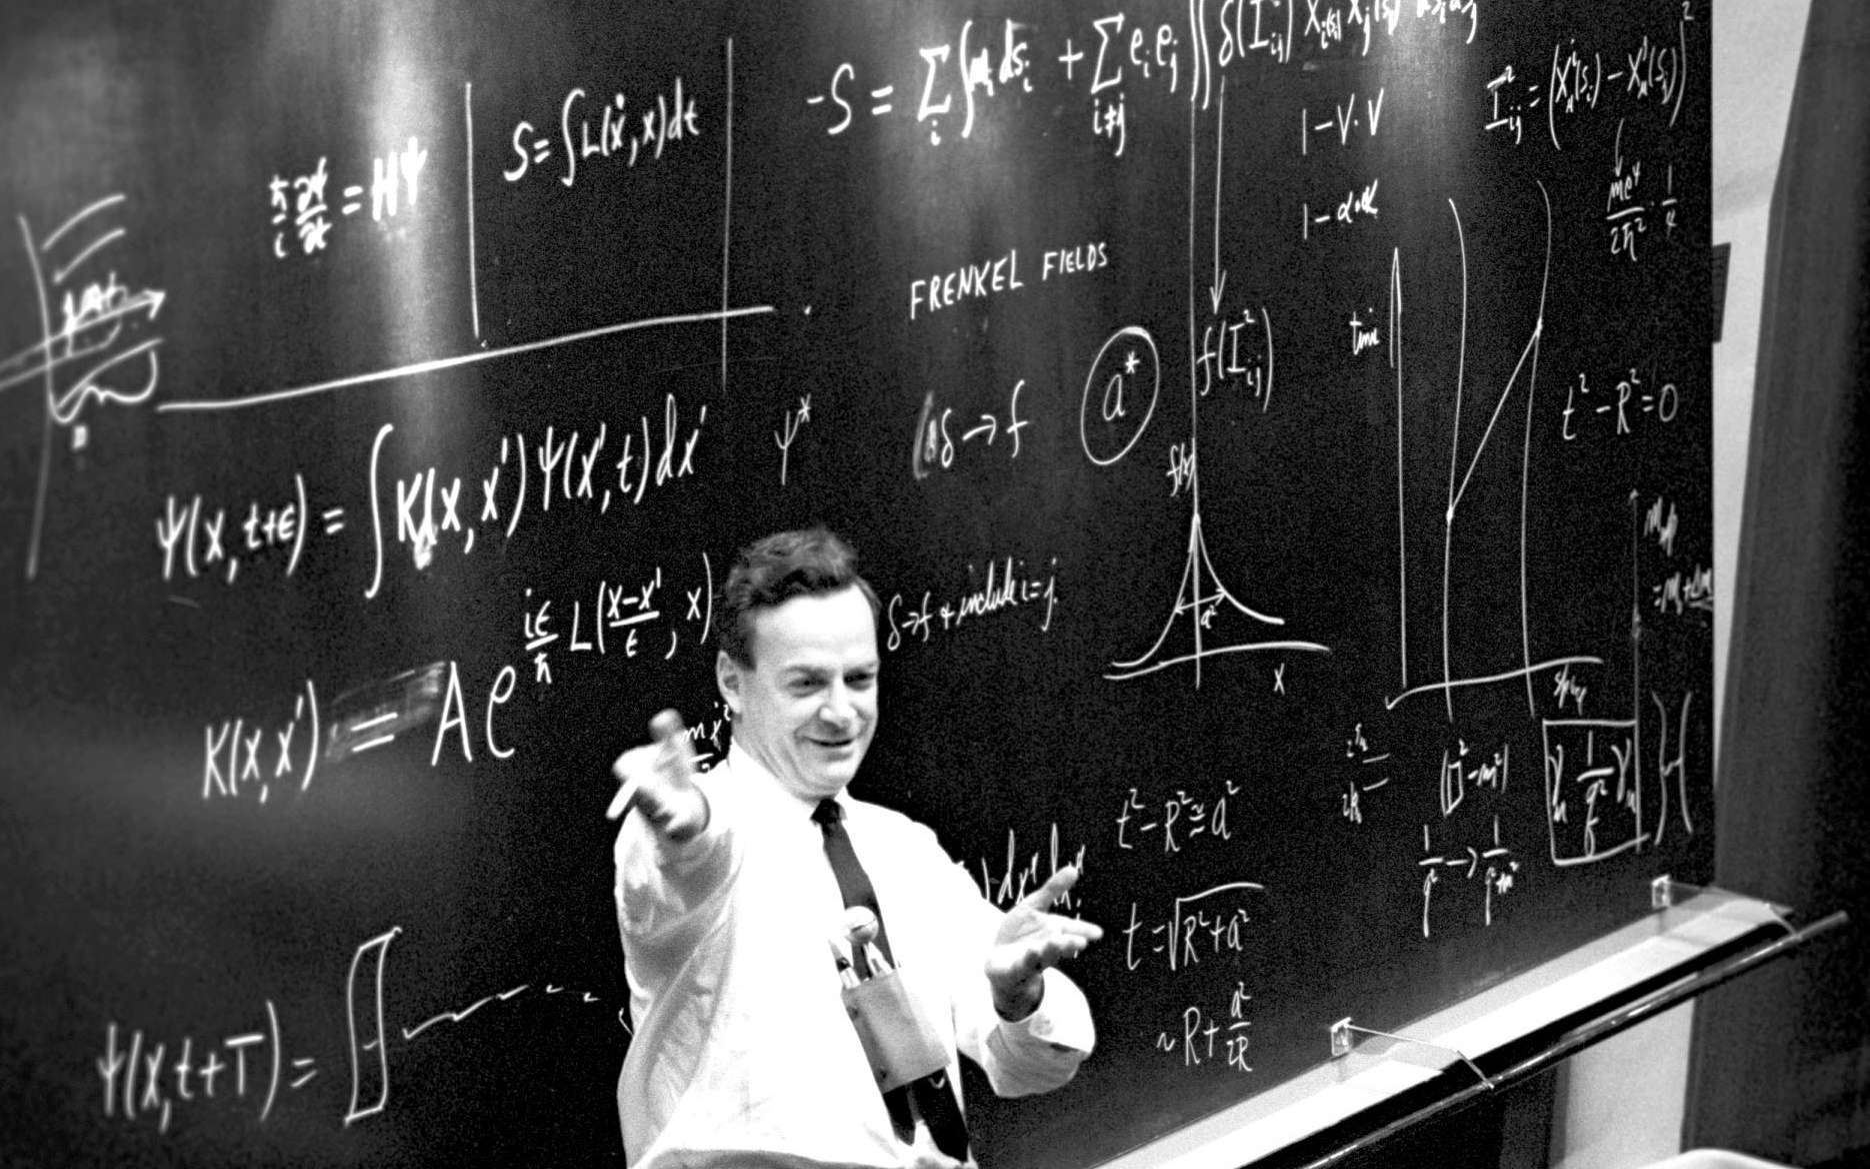 Richard Feynman en séminaire au Cern en 1965. © Cern